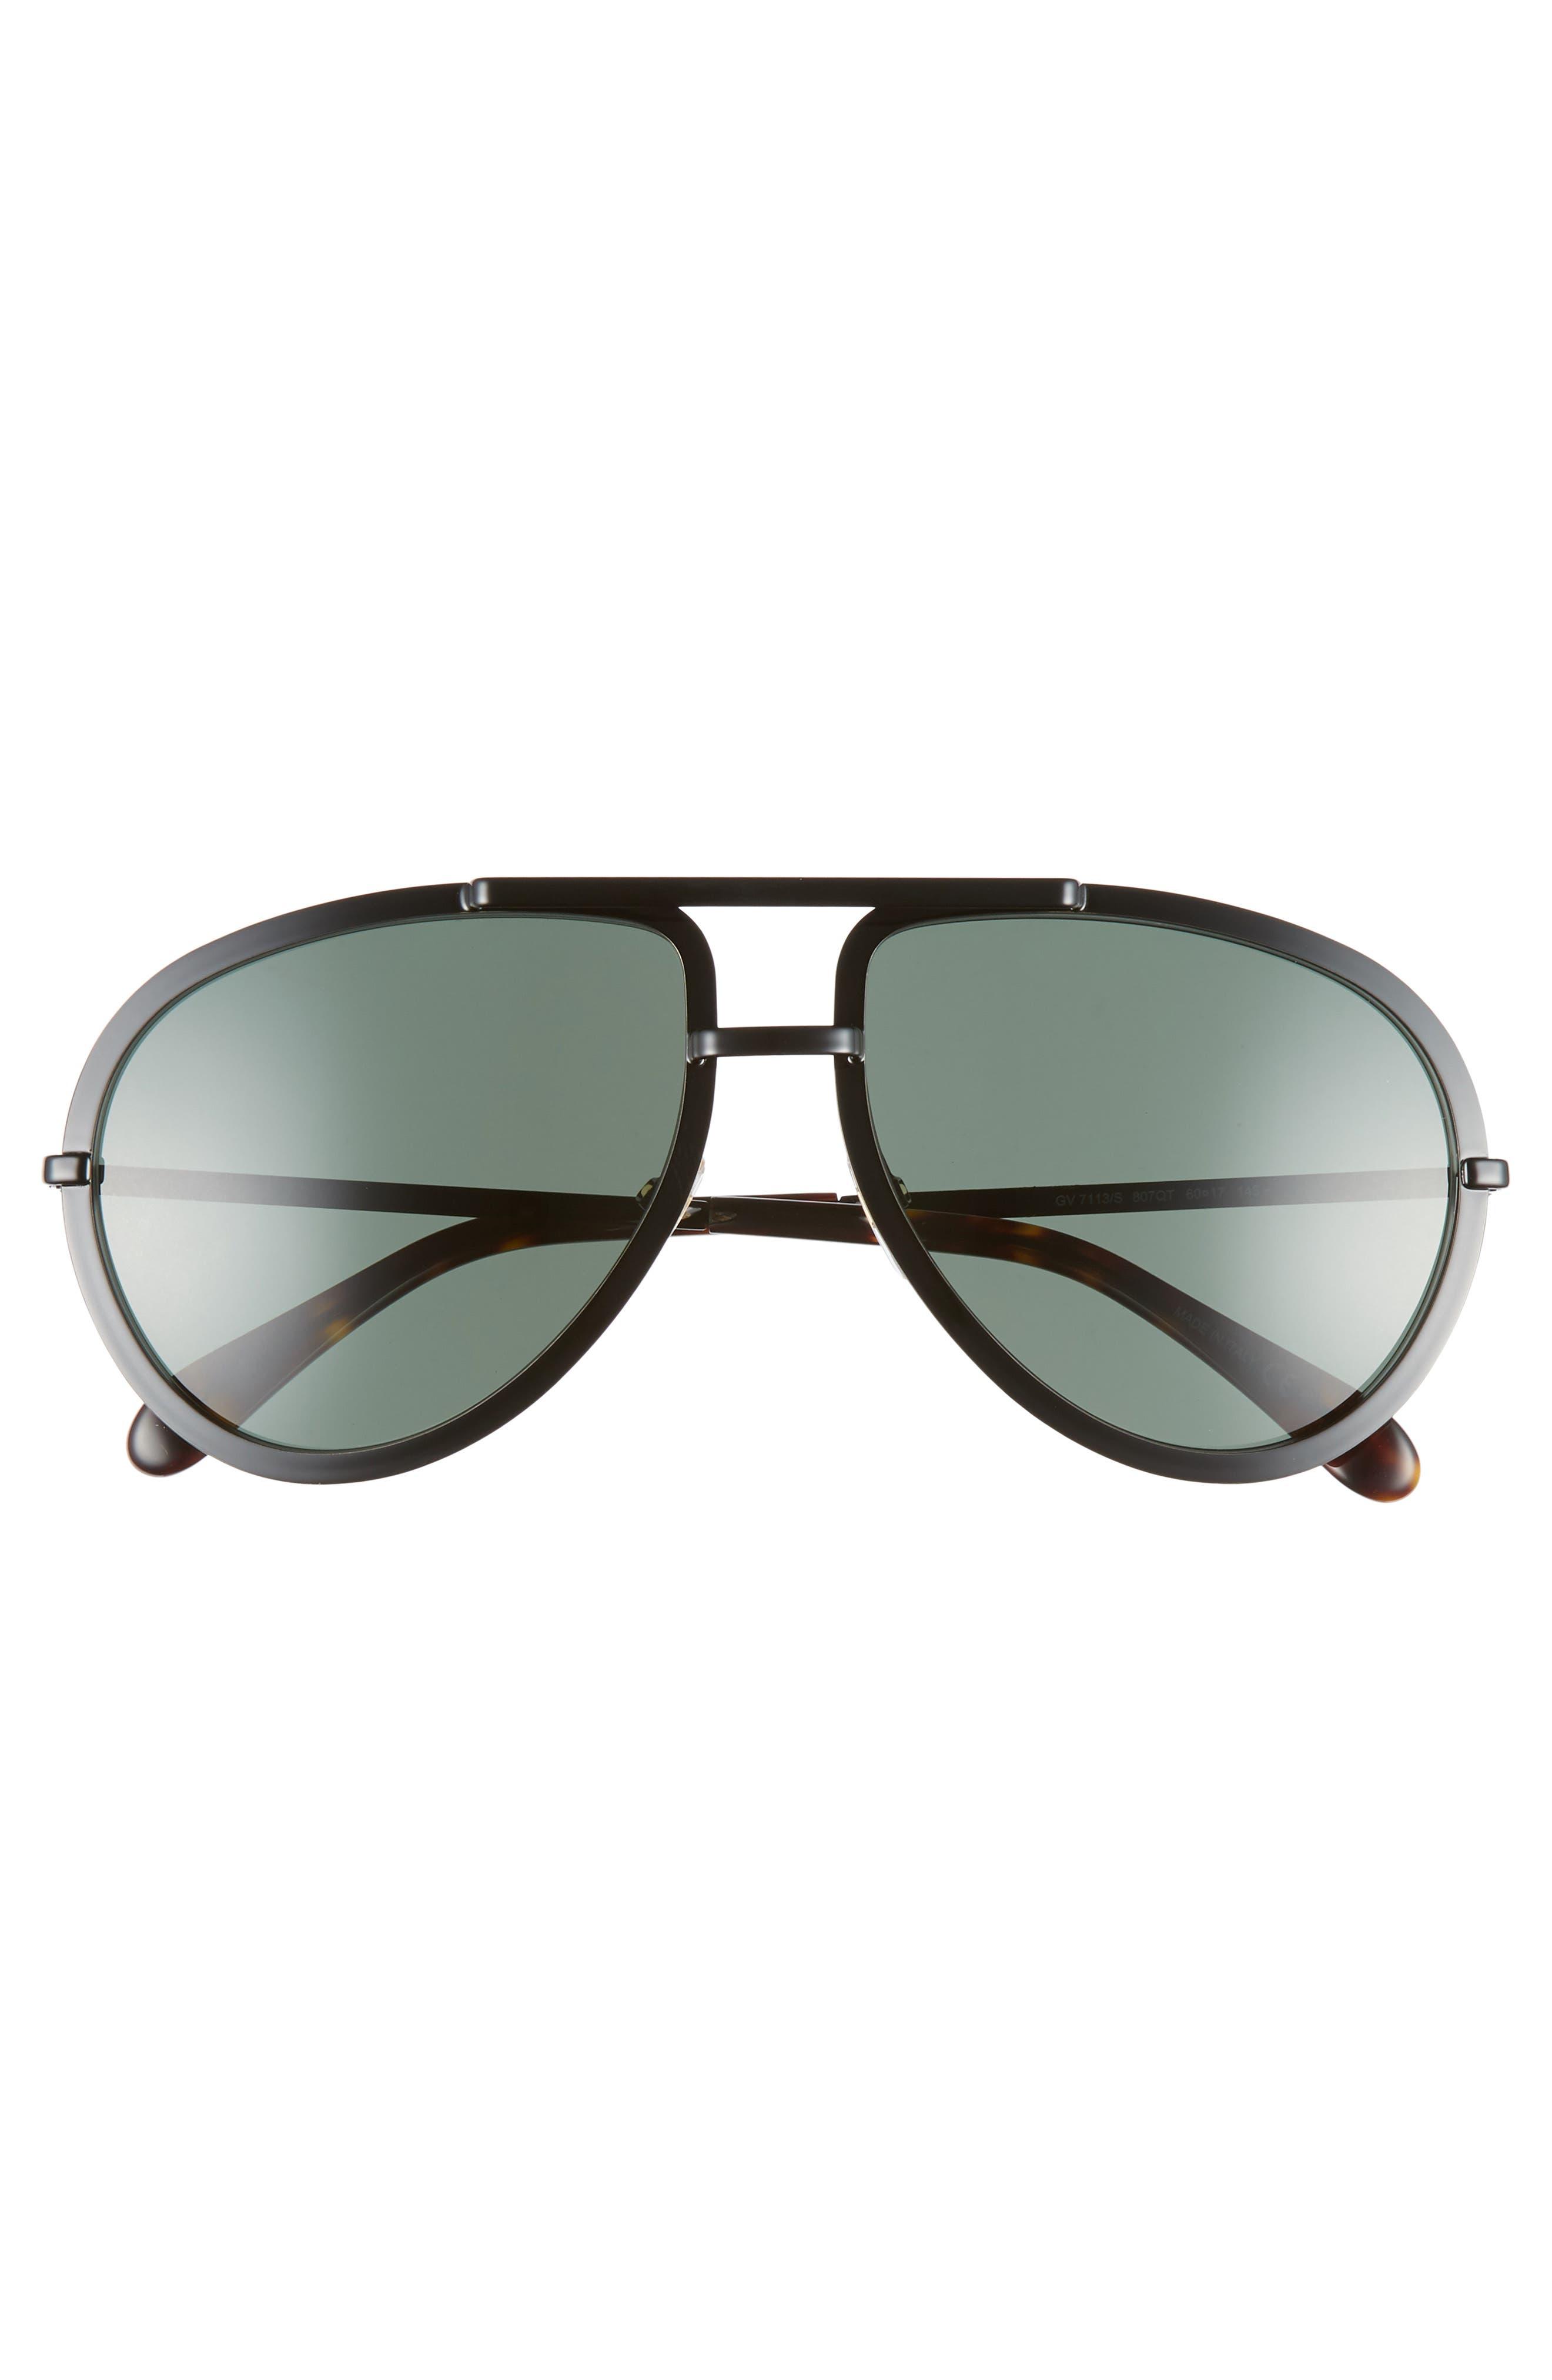 60mm Aviator Sunglasses,                             Alternate thumbnail 2, color,                             BLACK